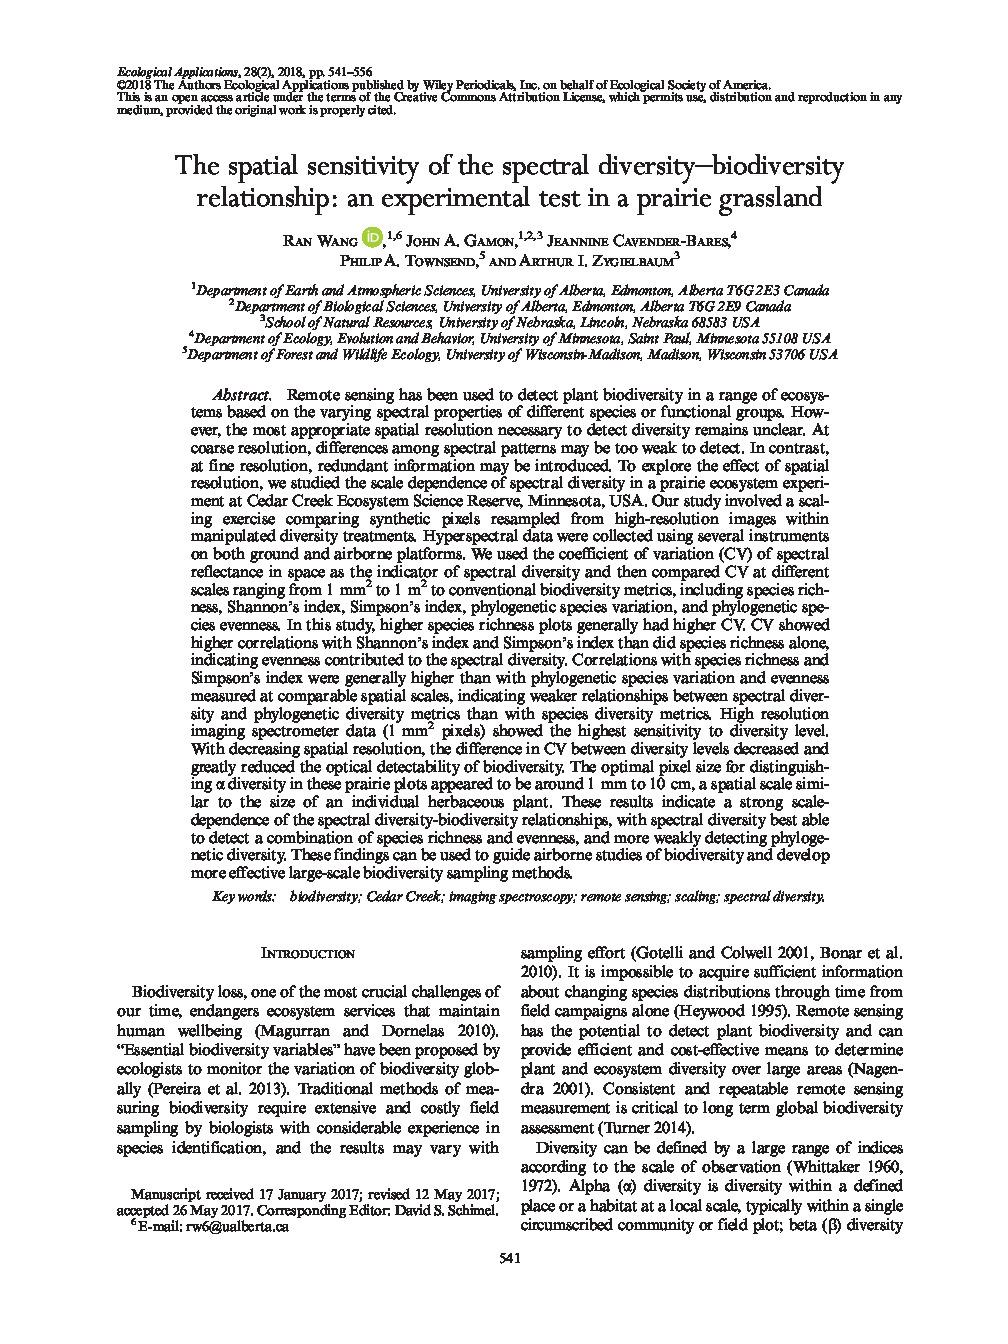 thumbnail of Spectral_diversity_biodiversity